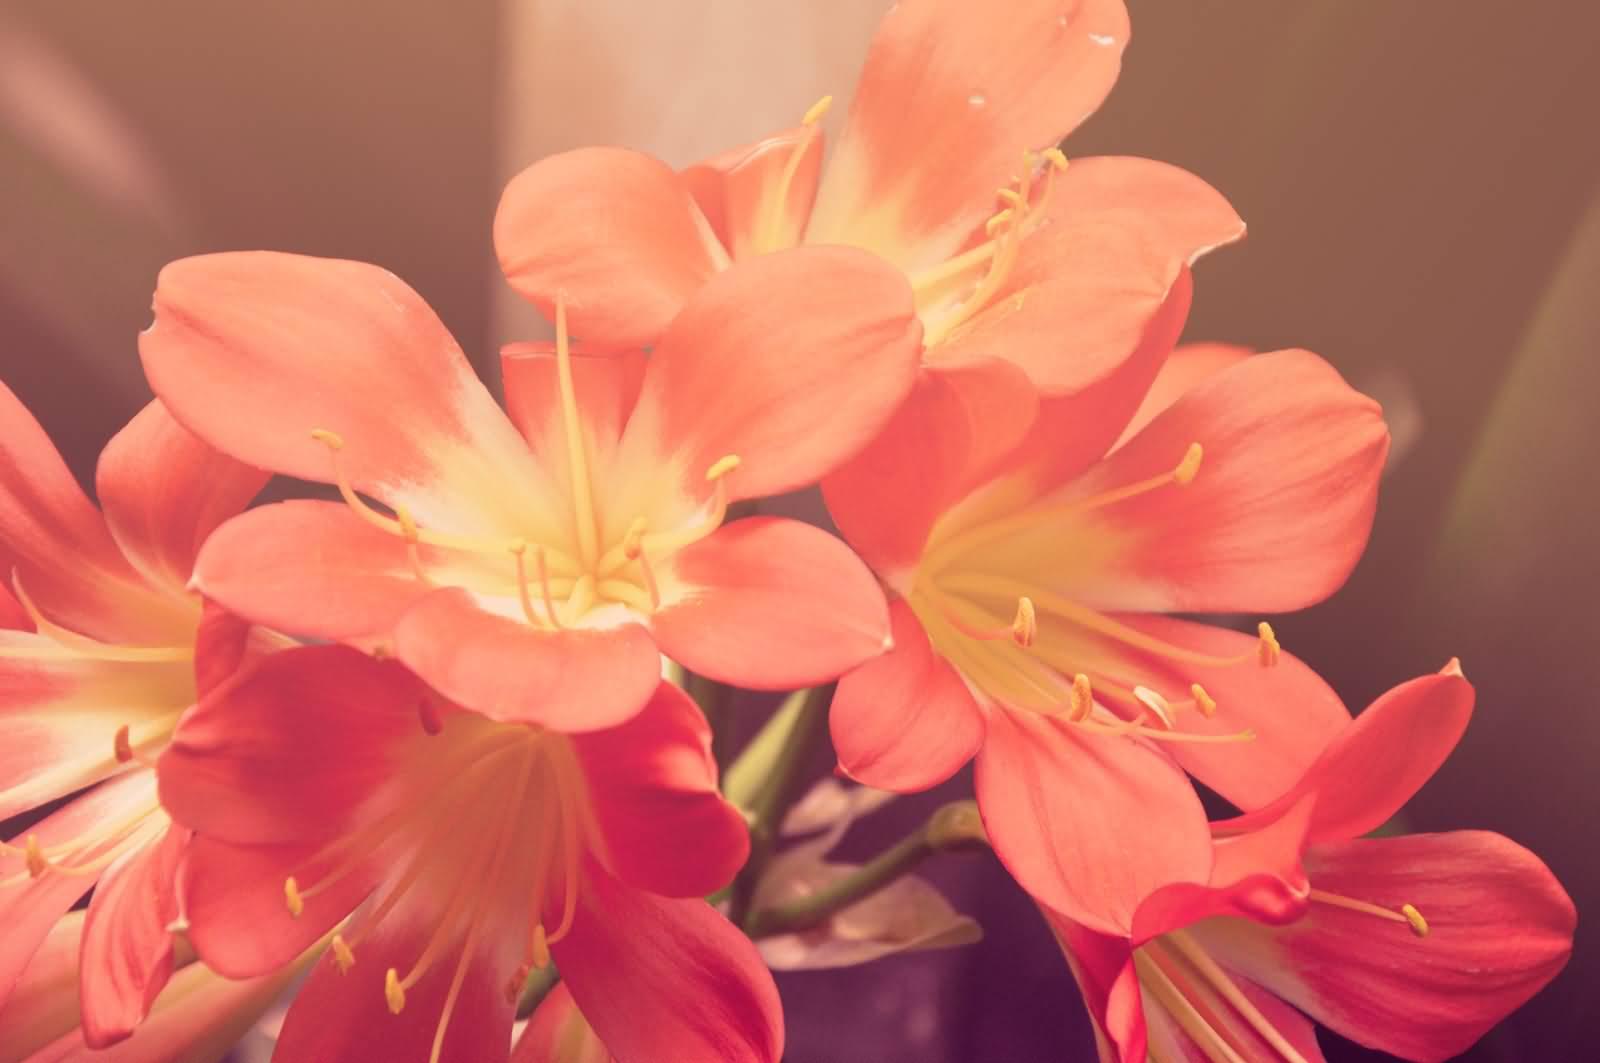 Beautiful Red Blooming Flowers